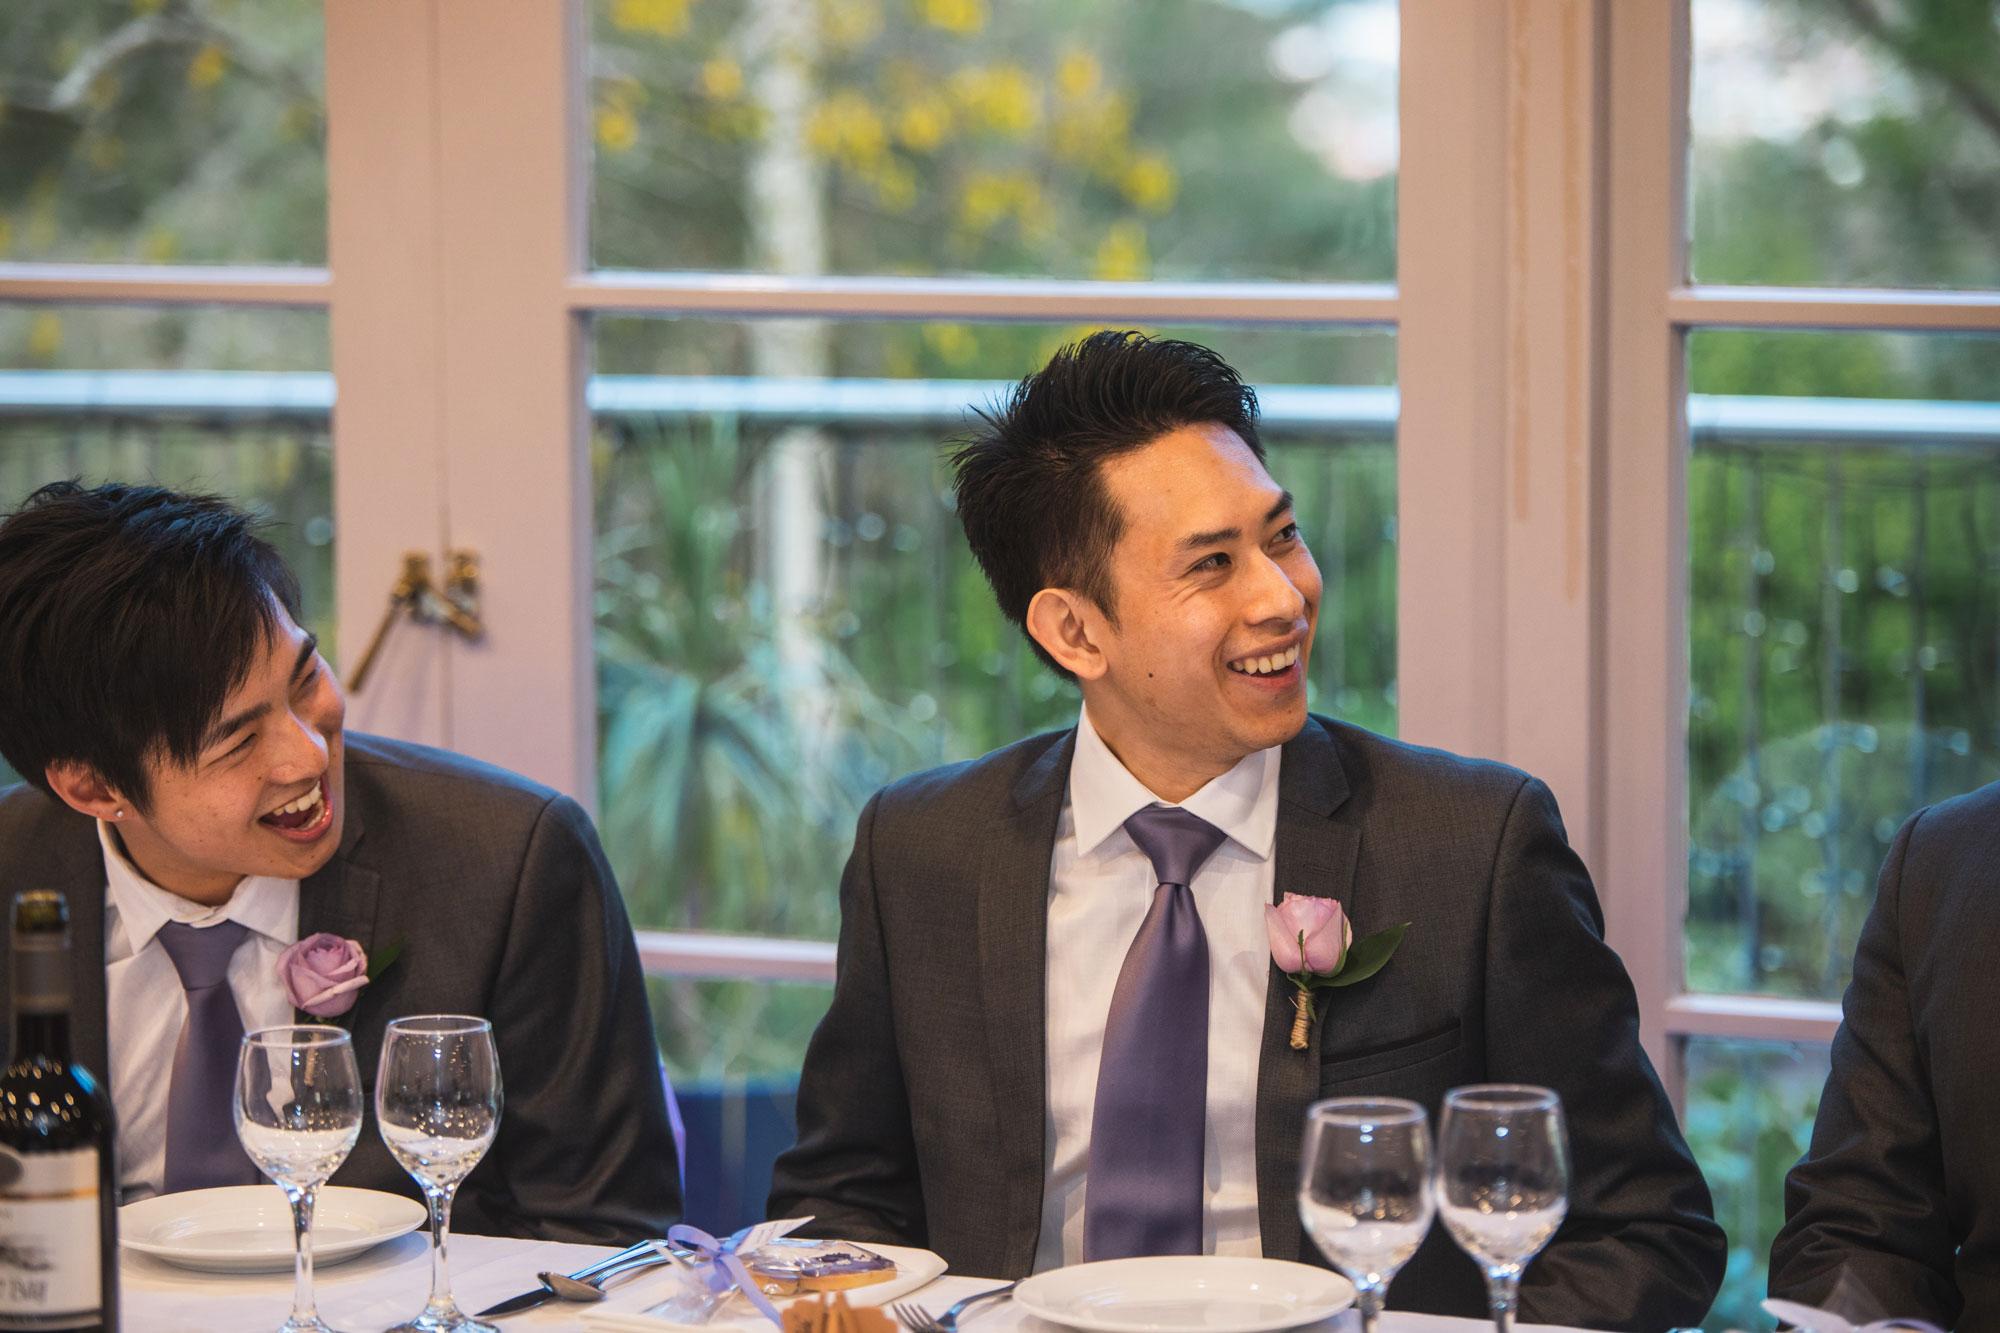 groomsman laughing at reception